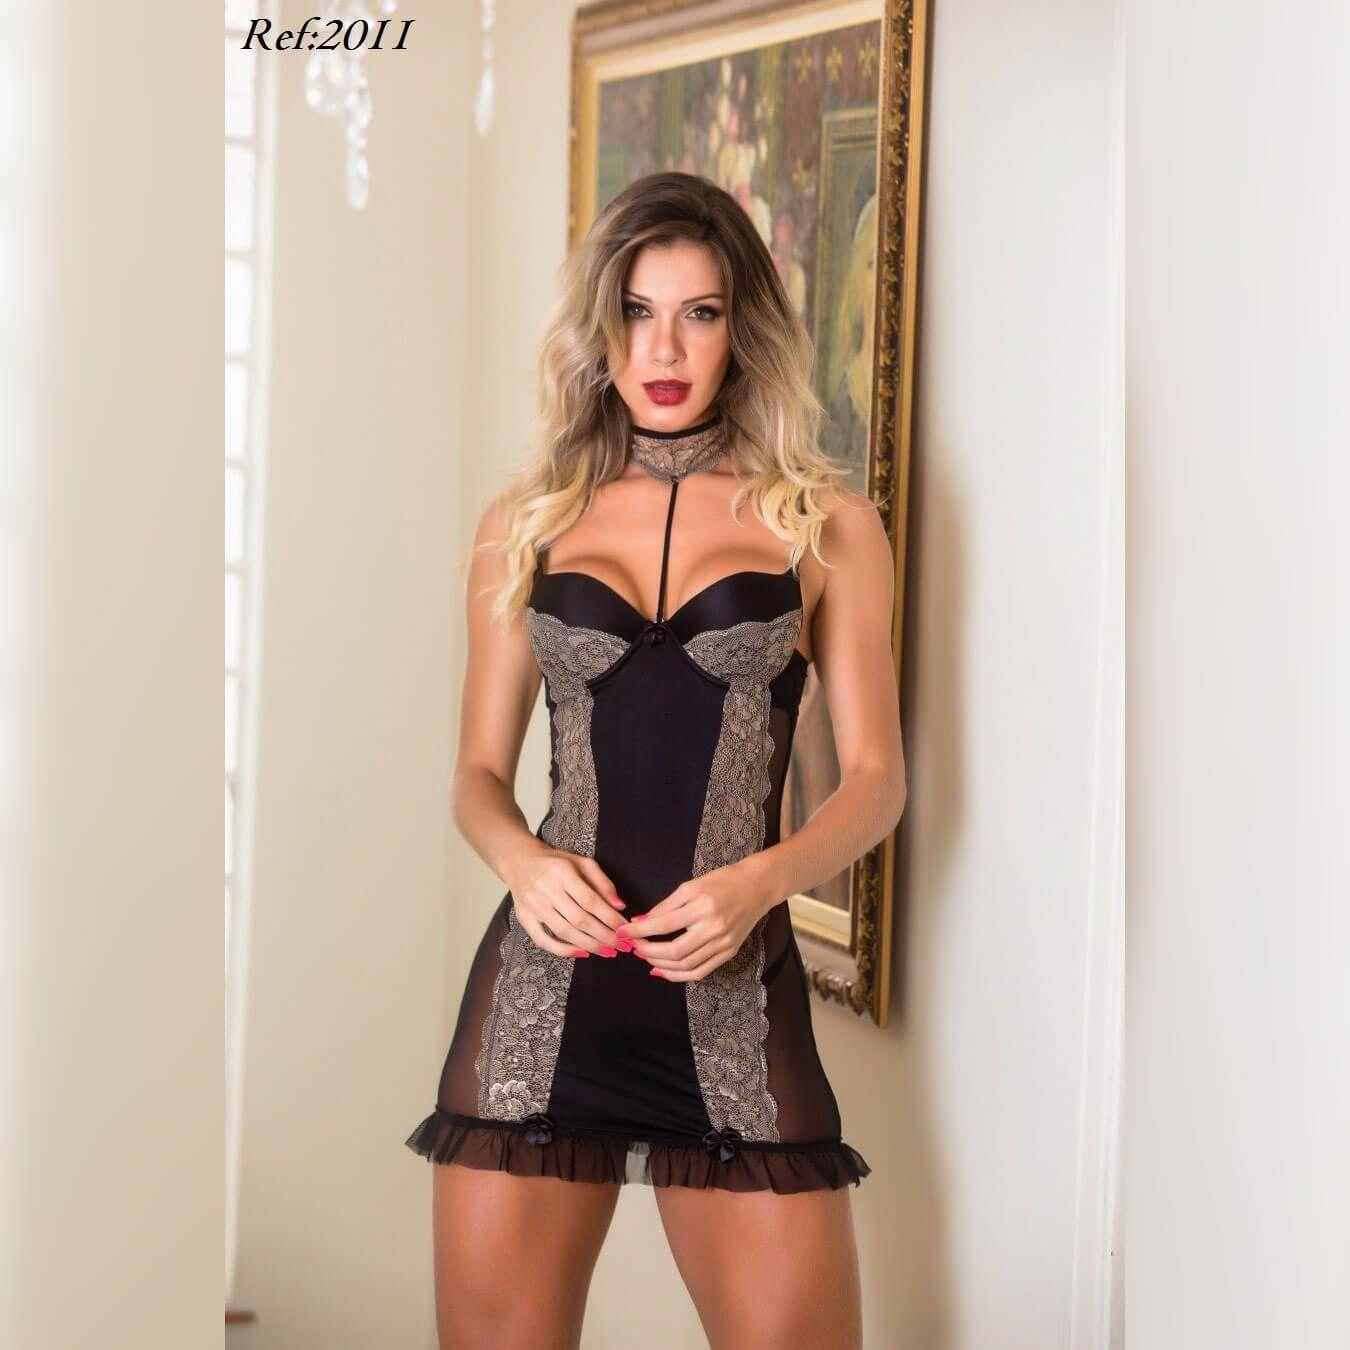 Camisola Sensual e provocante - Lingerie Garota veneno